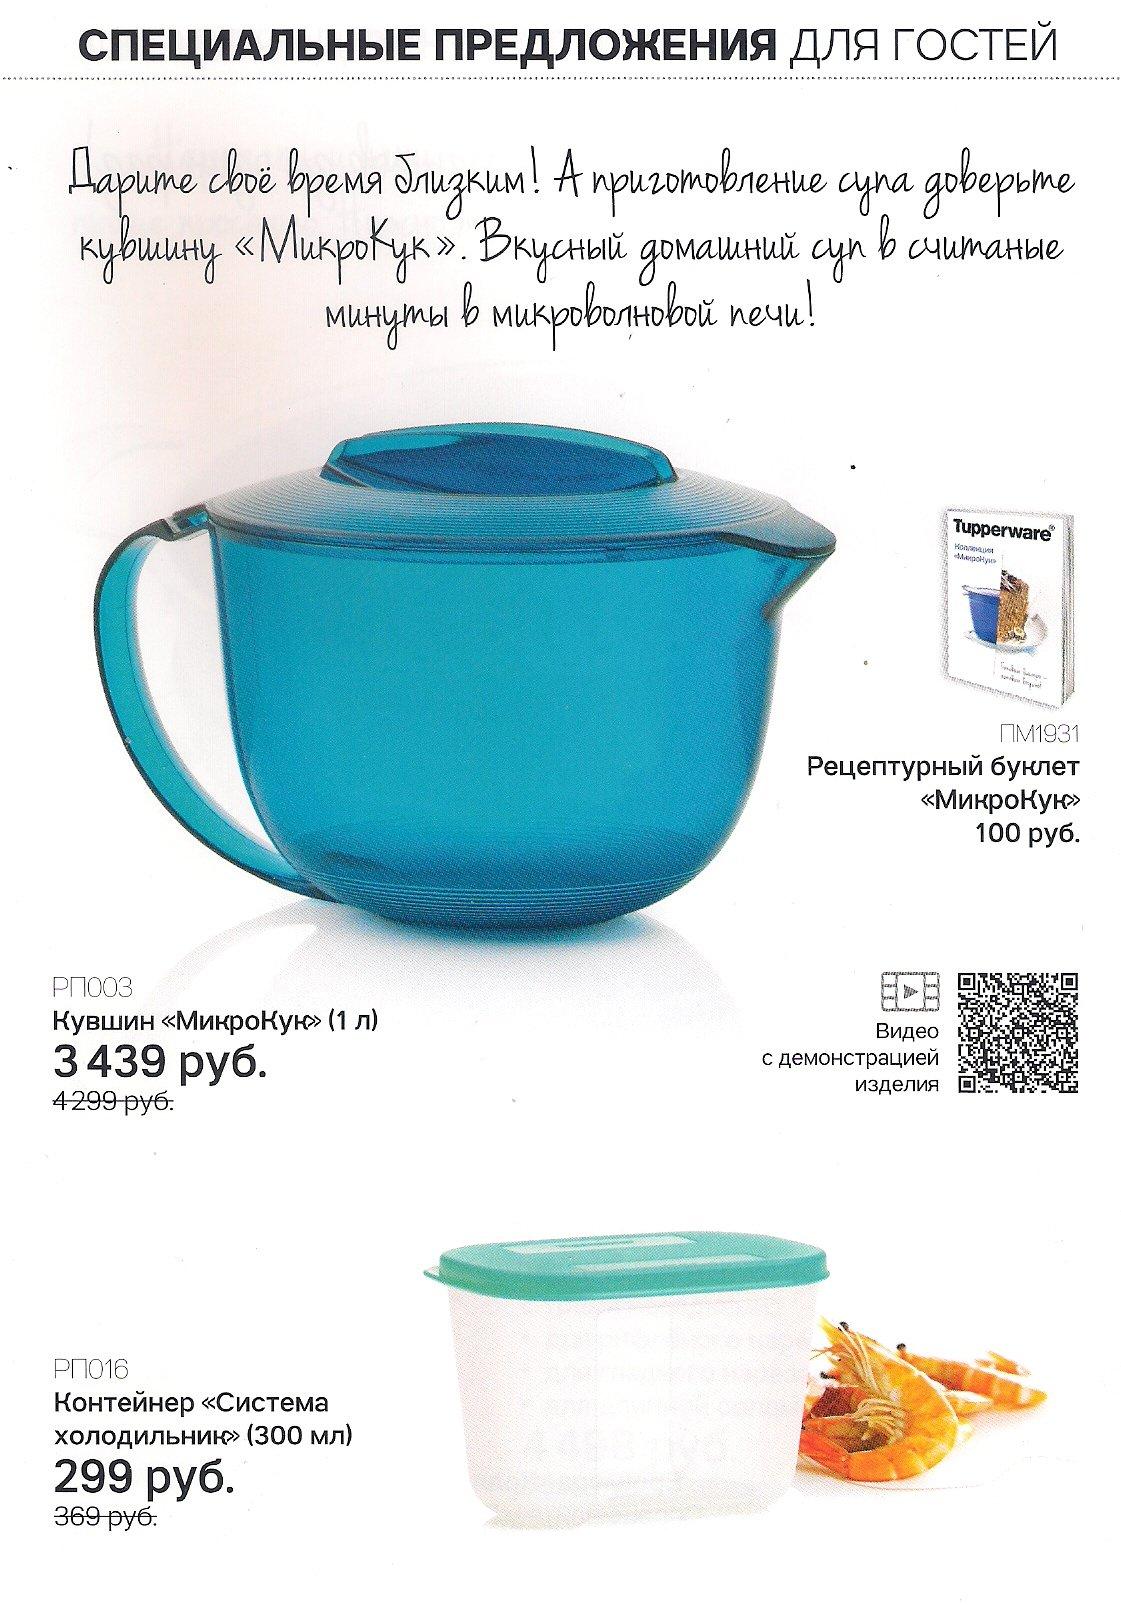 https://tupperware-online.ru/images/upload/13g.jpg